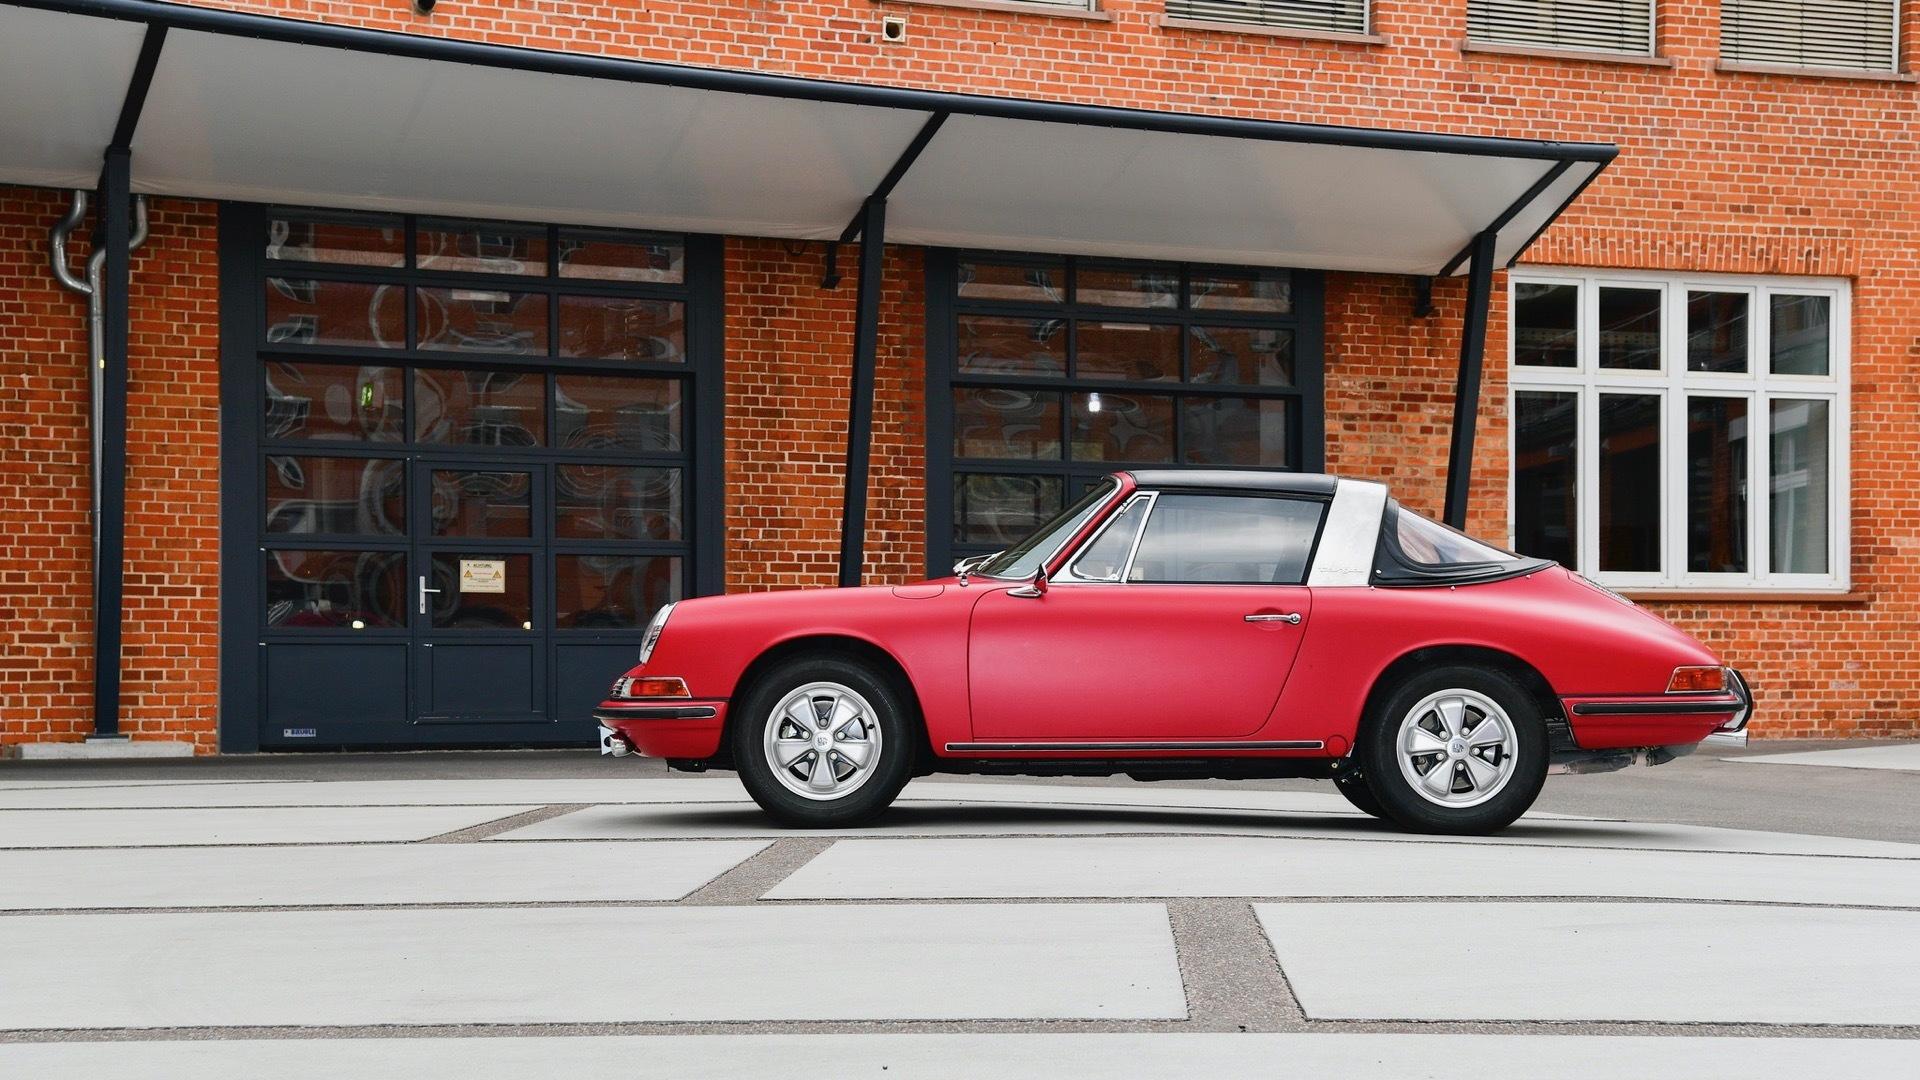 1967 Porsche 911 S Targa restored by Porsche Classic Factory Restoration